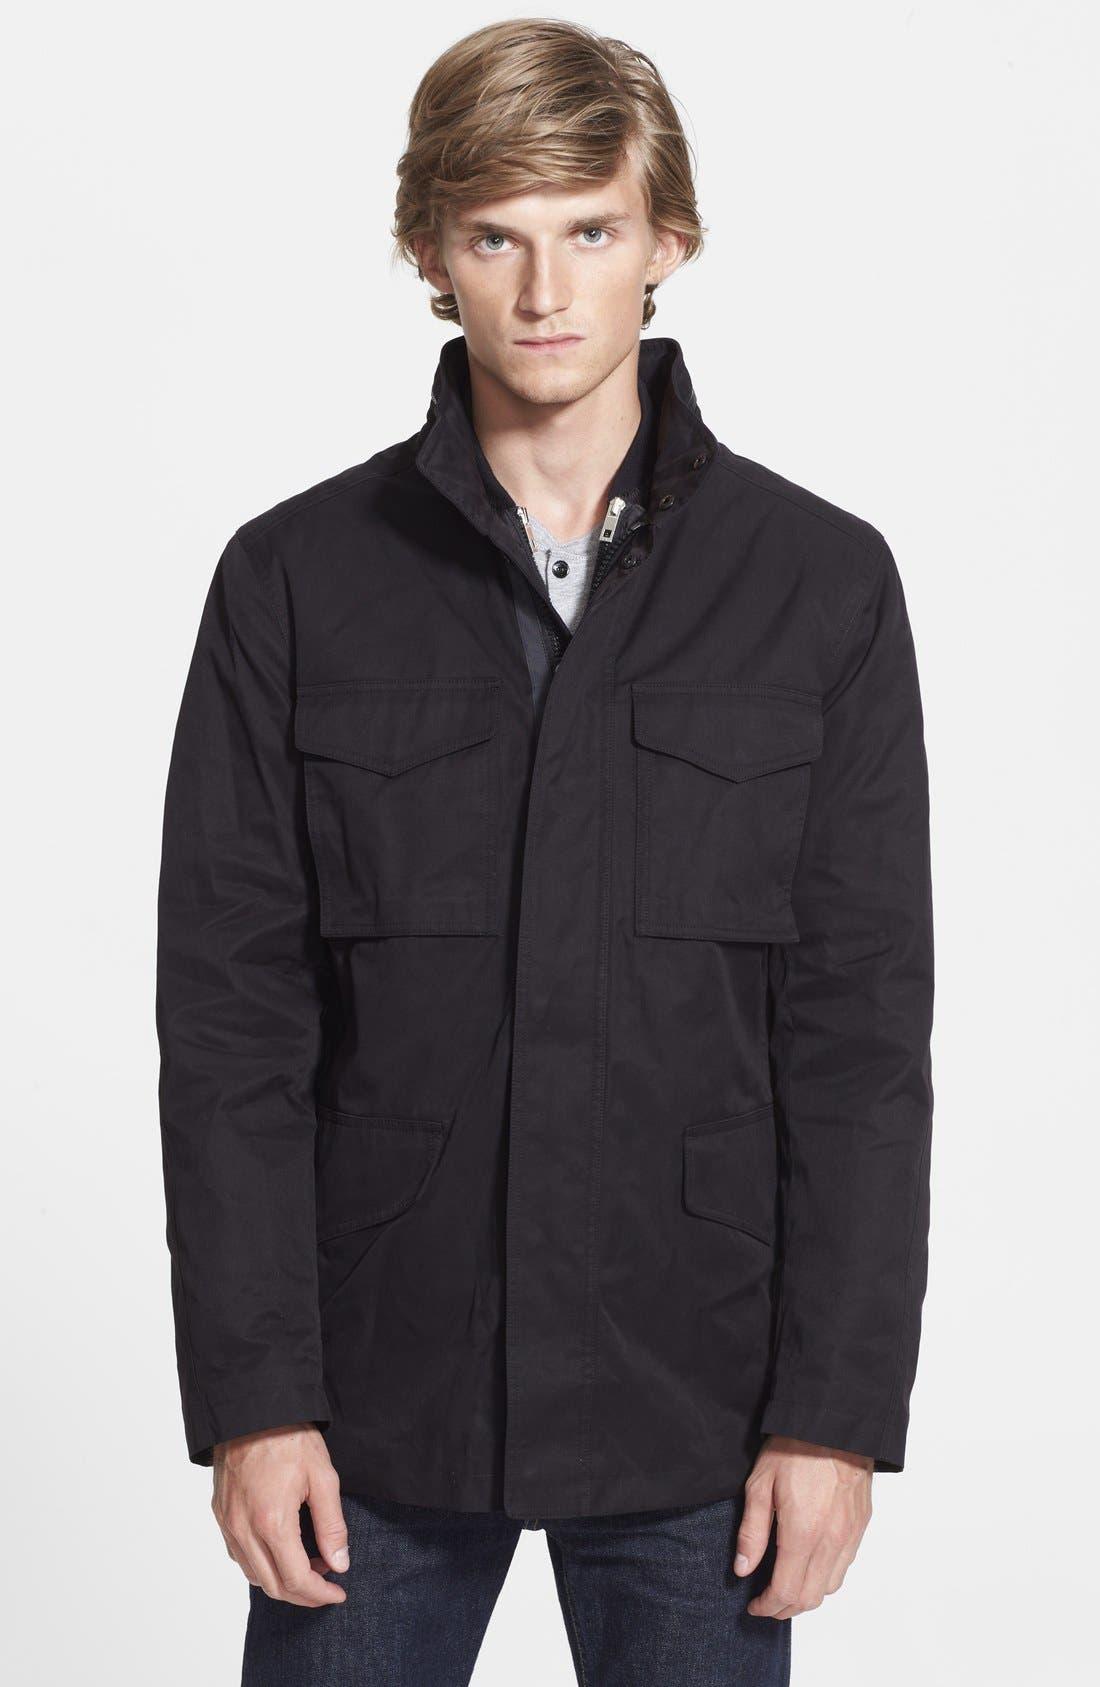 Alternate Image 1 Selected - rag & bone 'Division' 3-in-1 Field Jacket